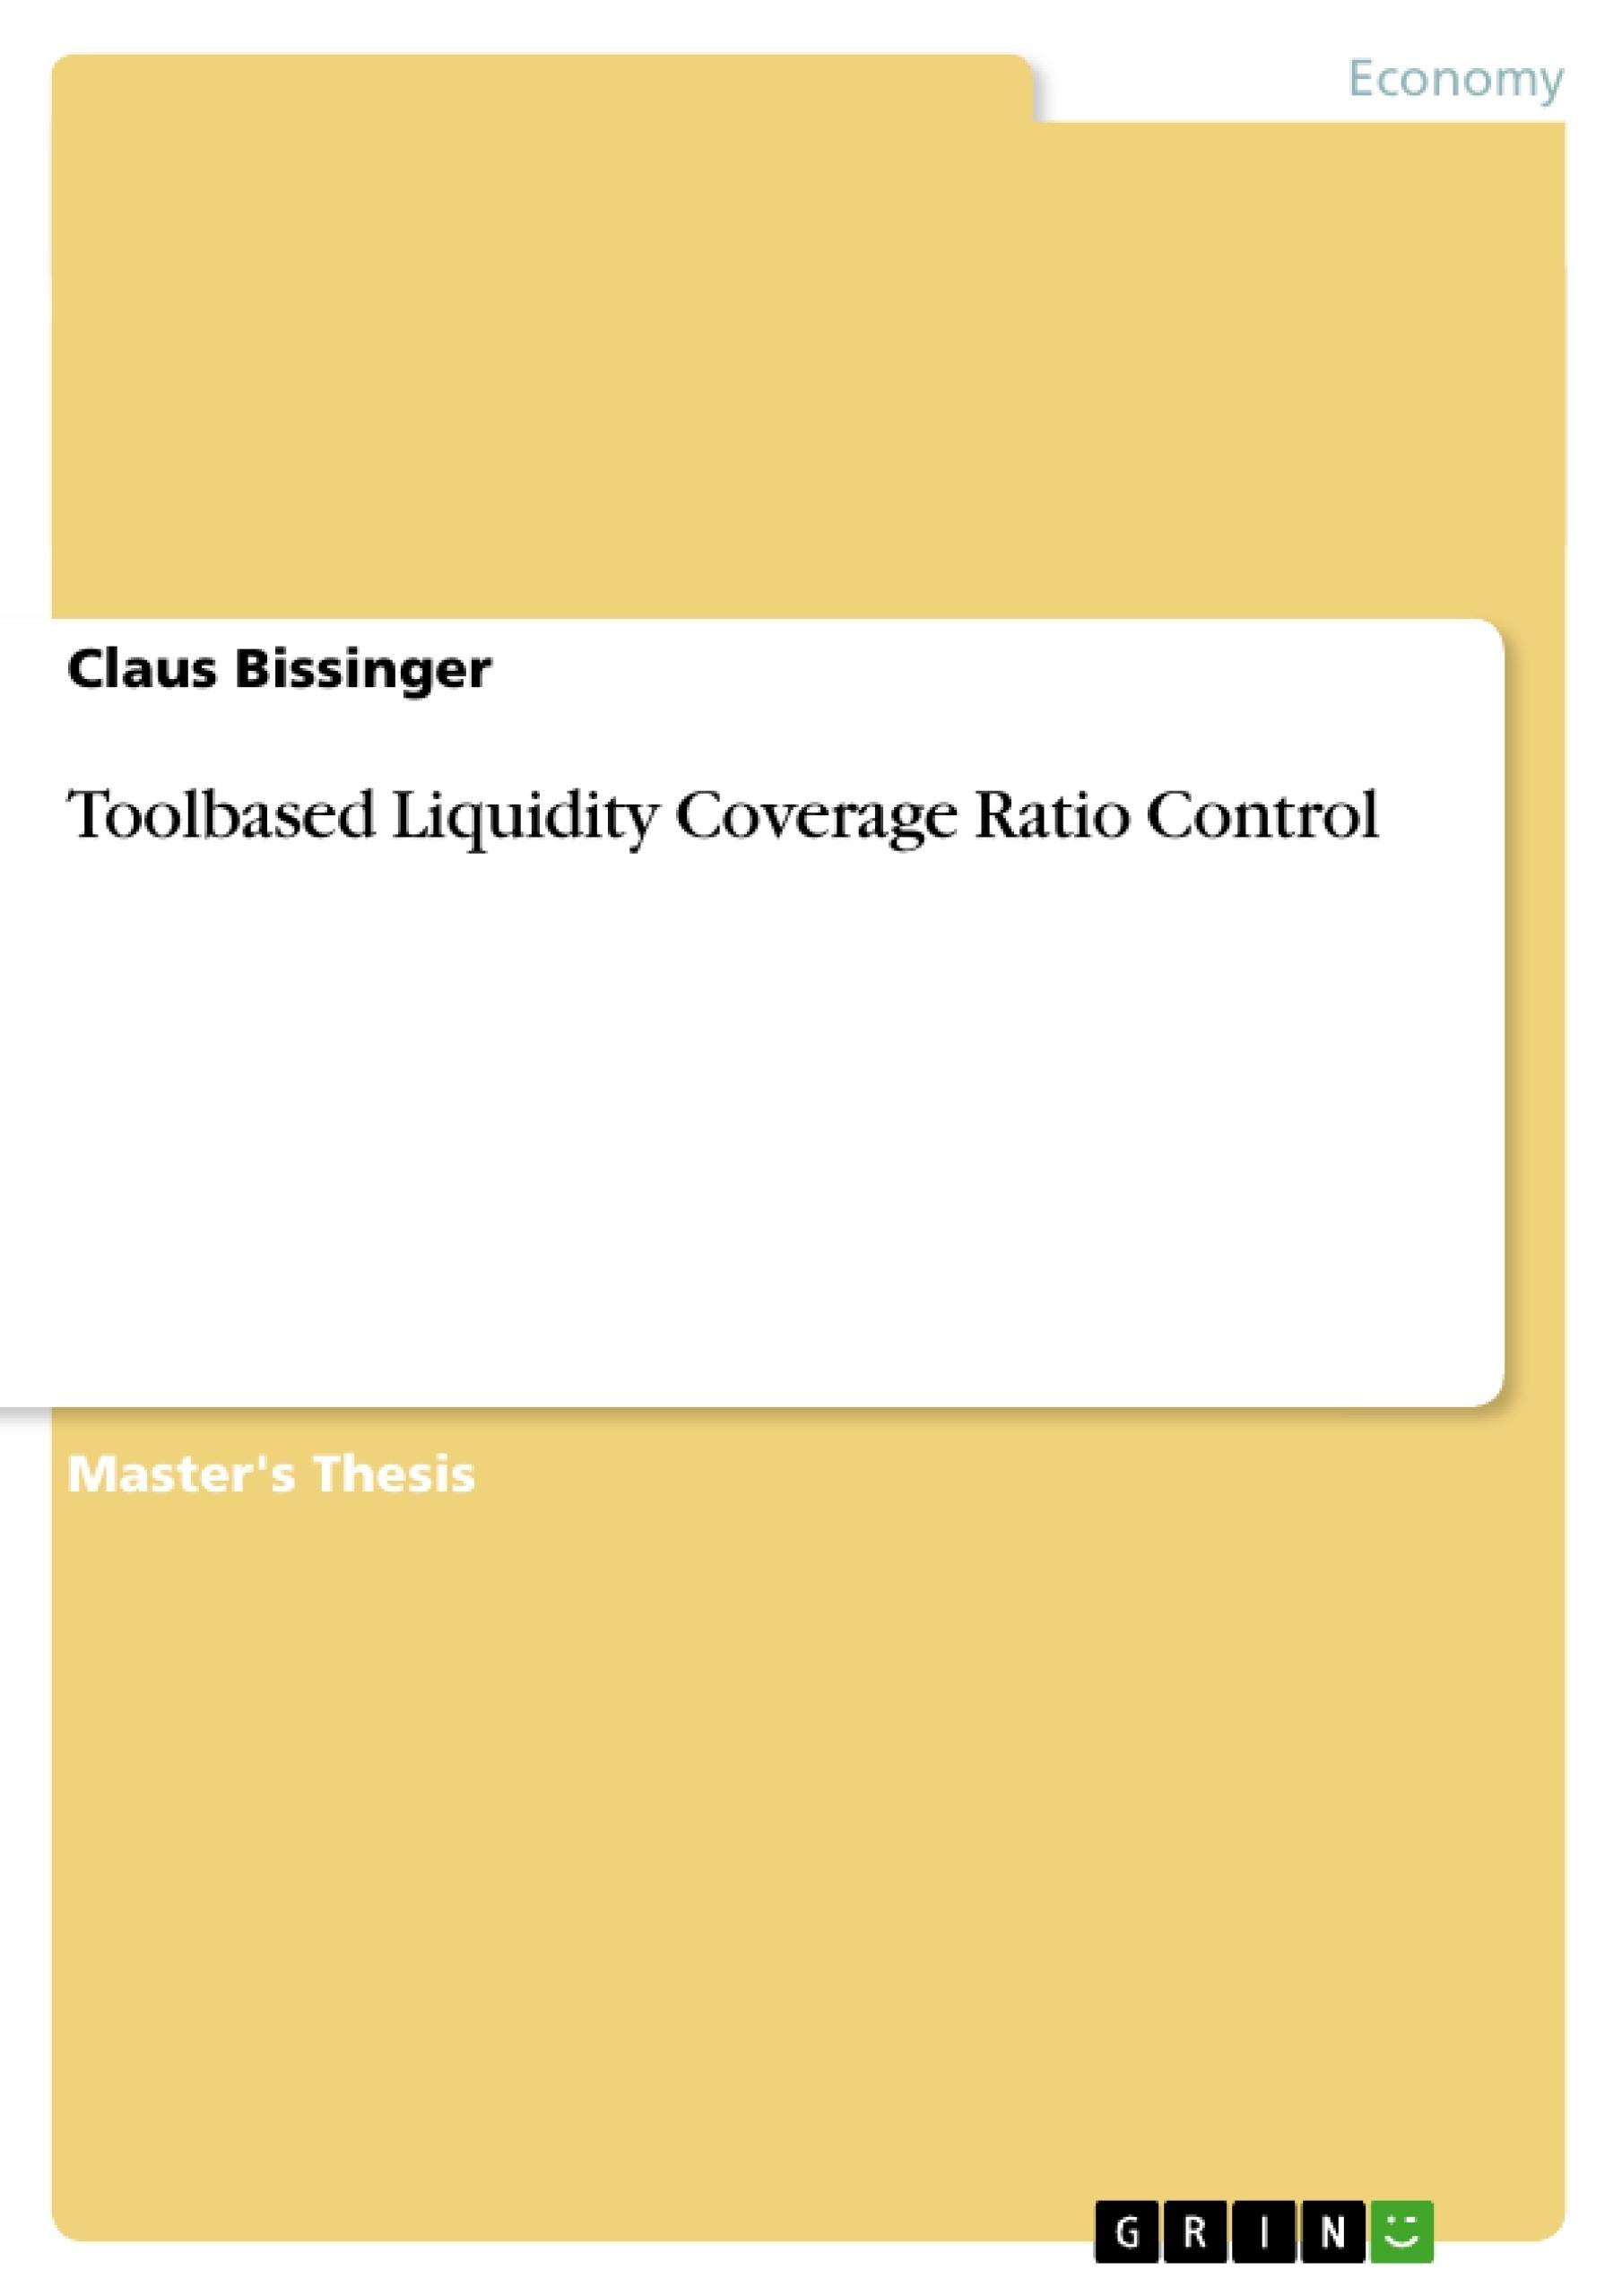 Title: Toolbased Liquidity Coverage Ratio Control